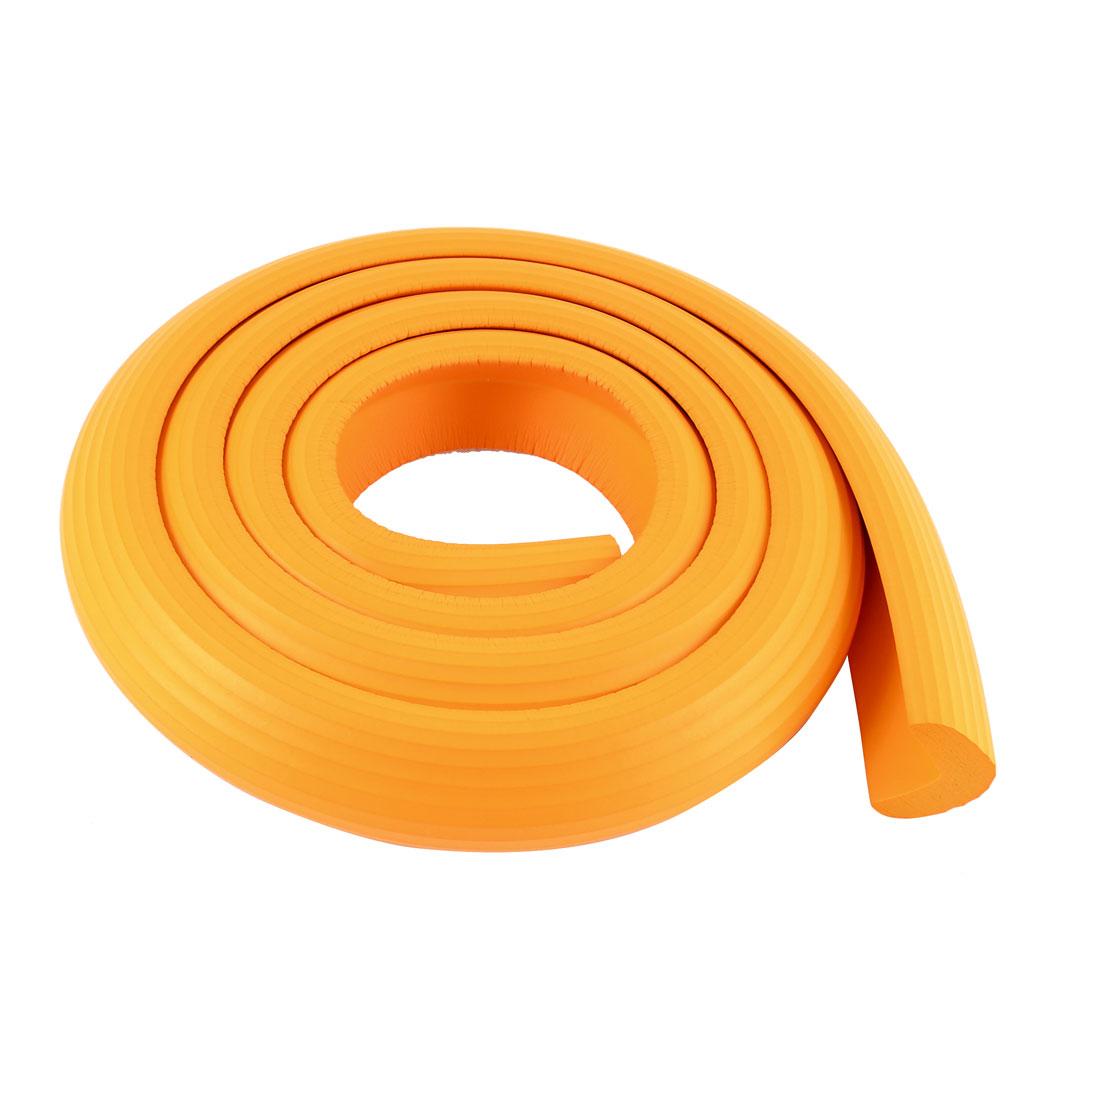 Furniture Corner Edge Soft Safety Protection Cushion Guard 35mm x 12mm Orange